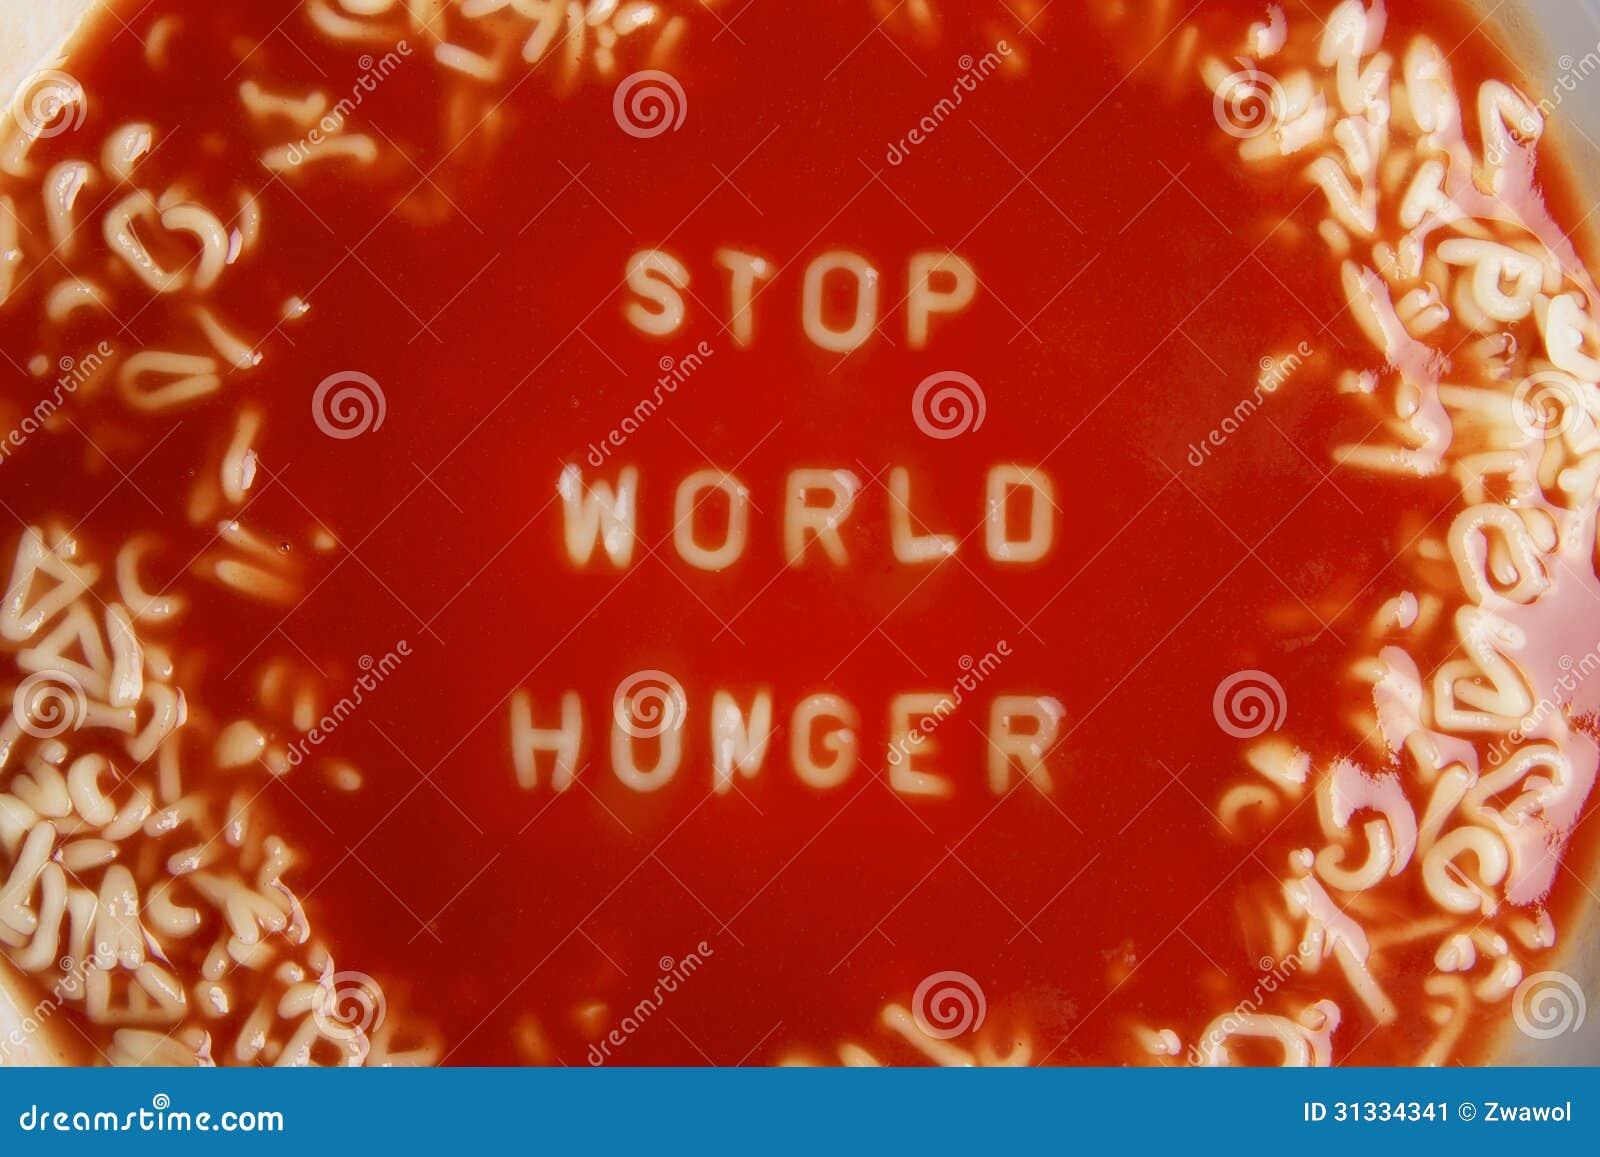 stop world hunger essay